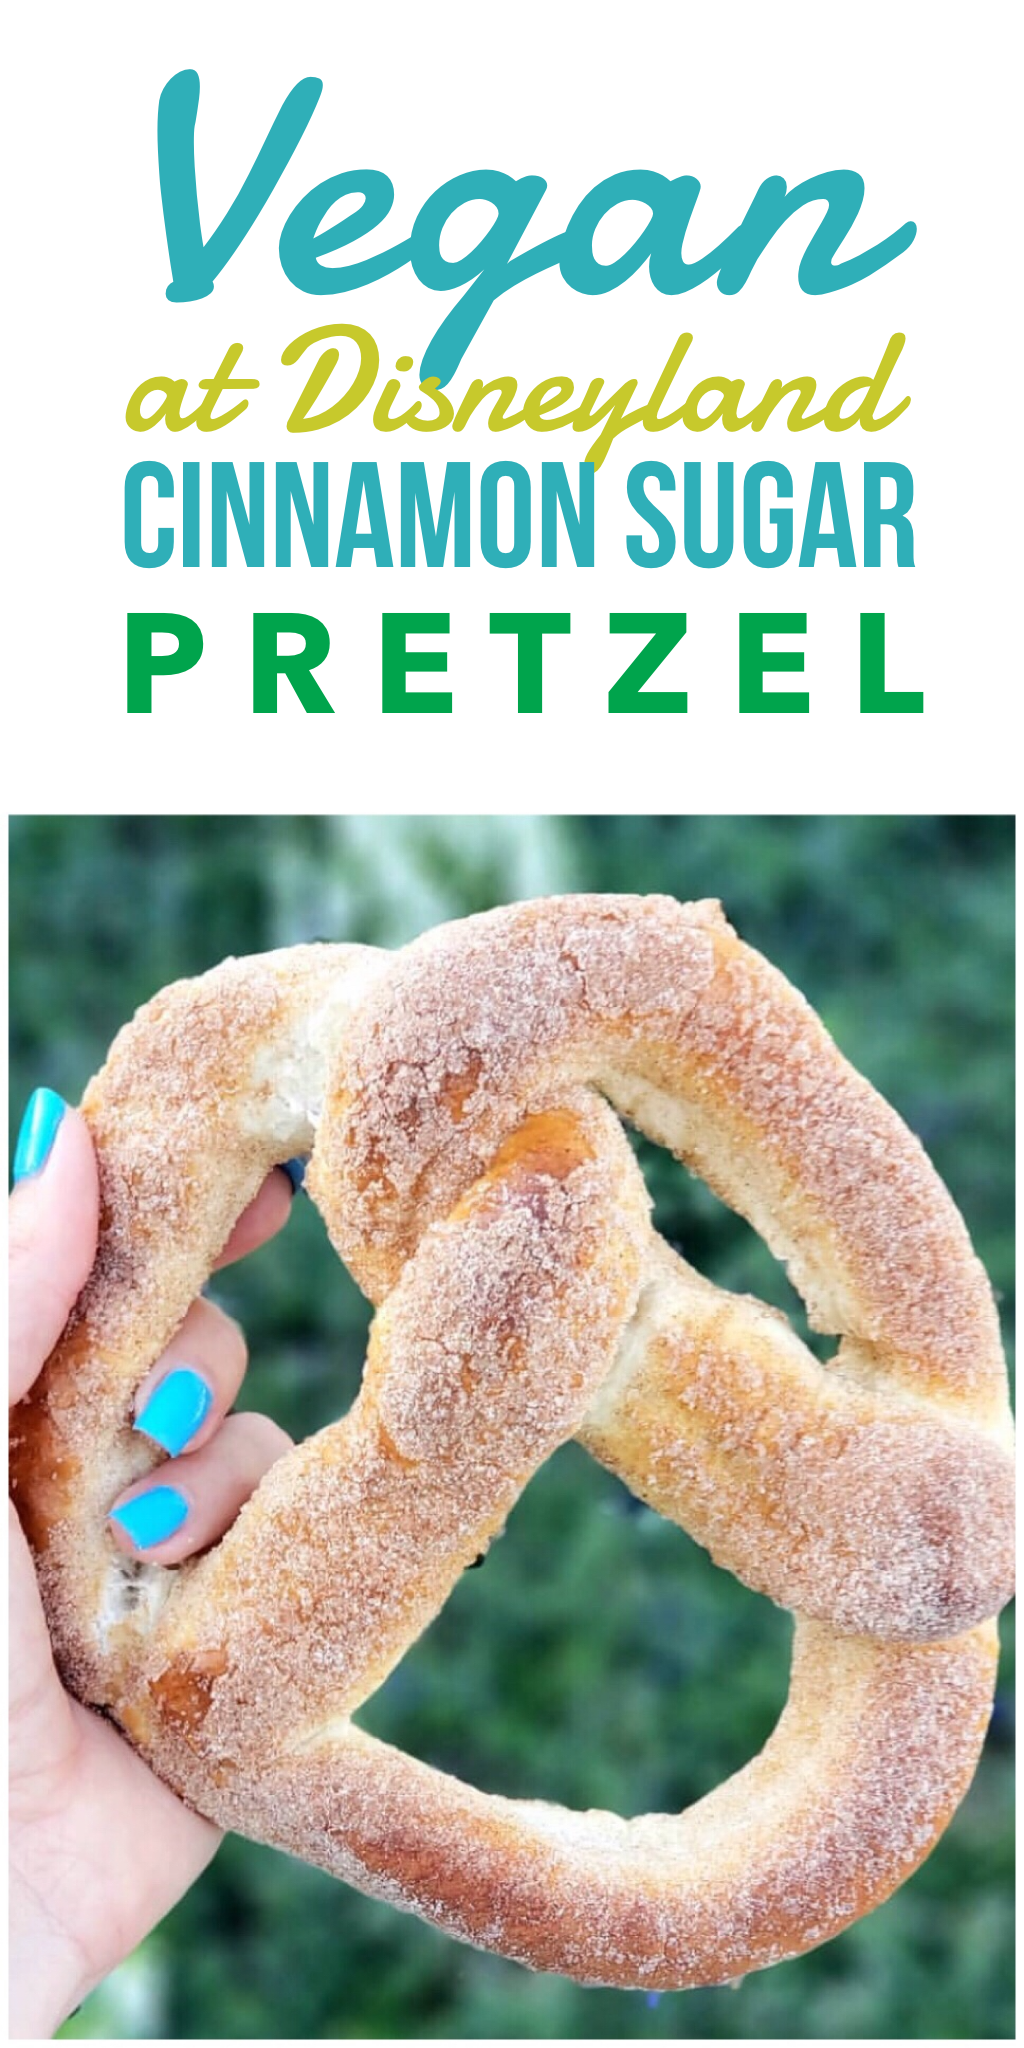 Vegan Snack Option at Disneyland - Cinnamon Sugar Pretzel